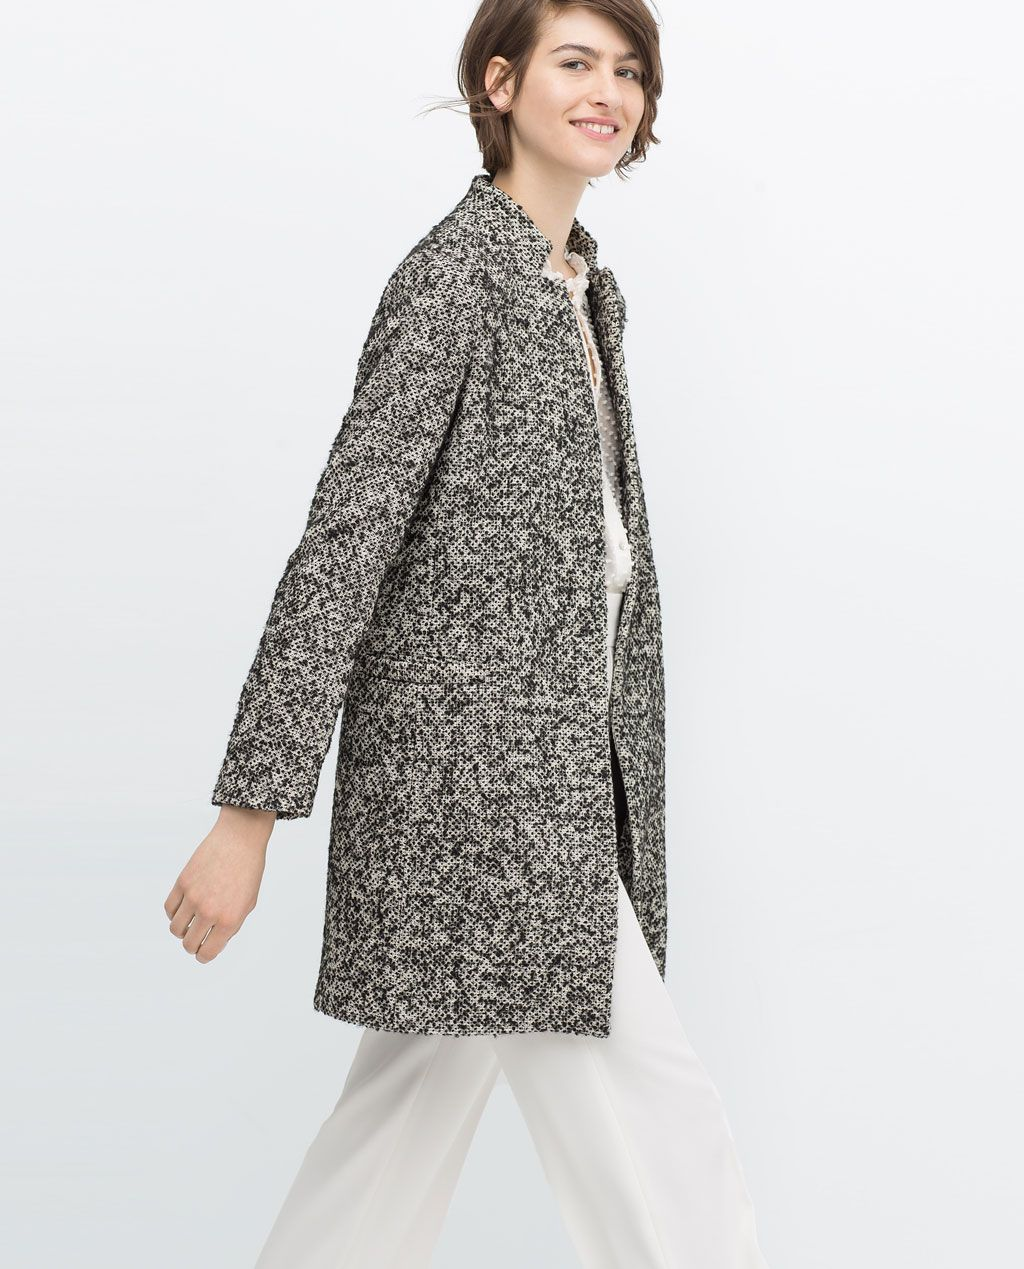 Black Boucle Coat Special Prices Woman Mantel Damen Oberbekleidung Frauen Mantel